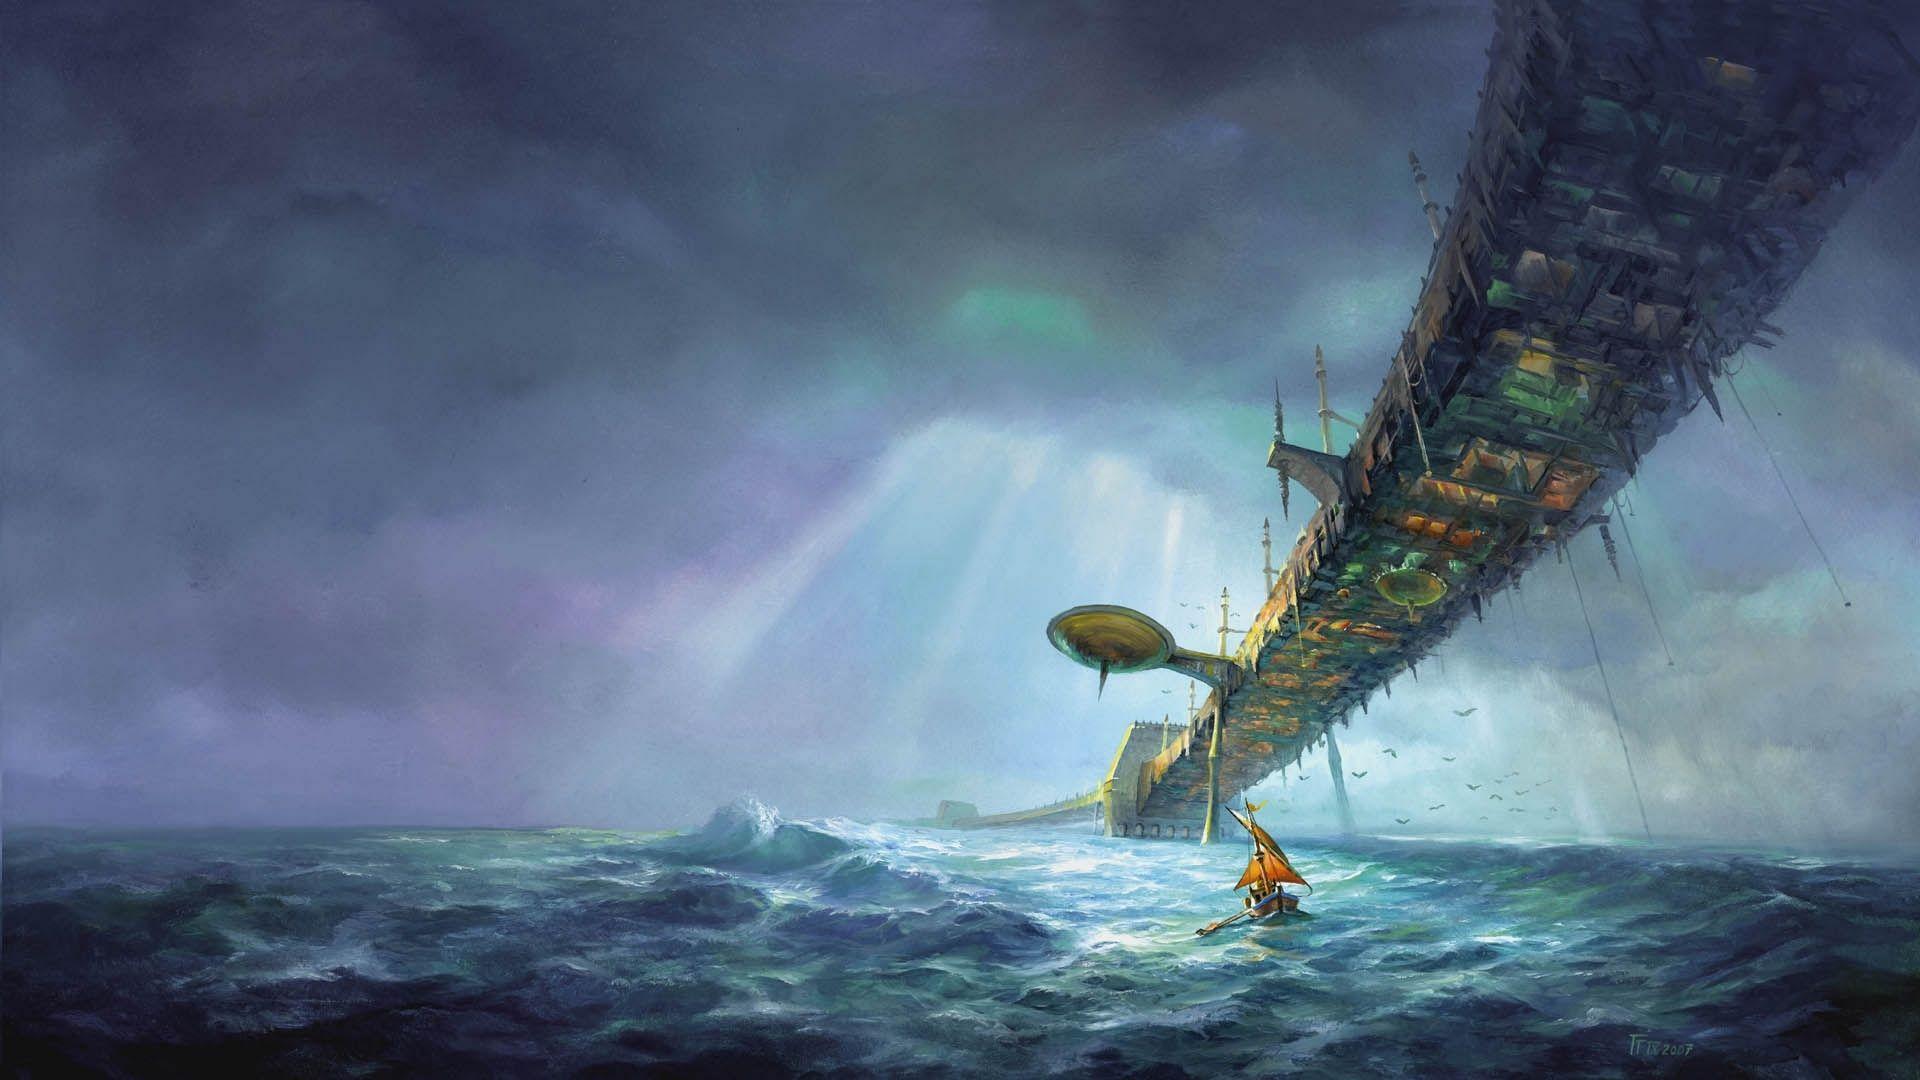 sailboats moored pink sky painting fantasy art sci fi